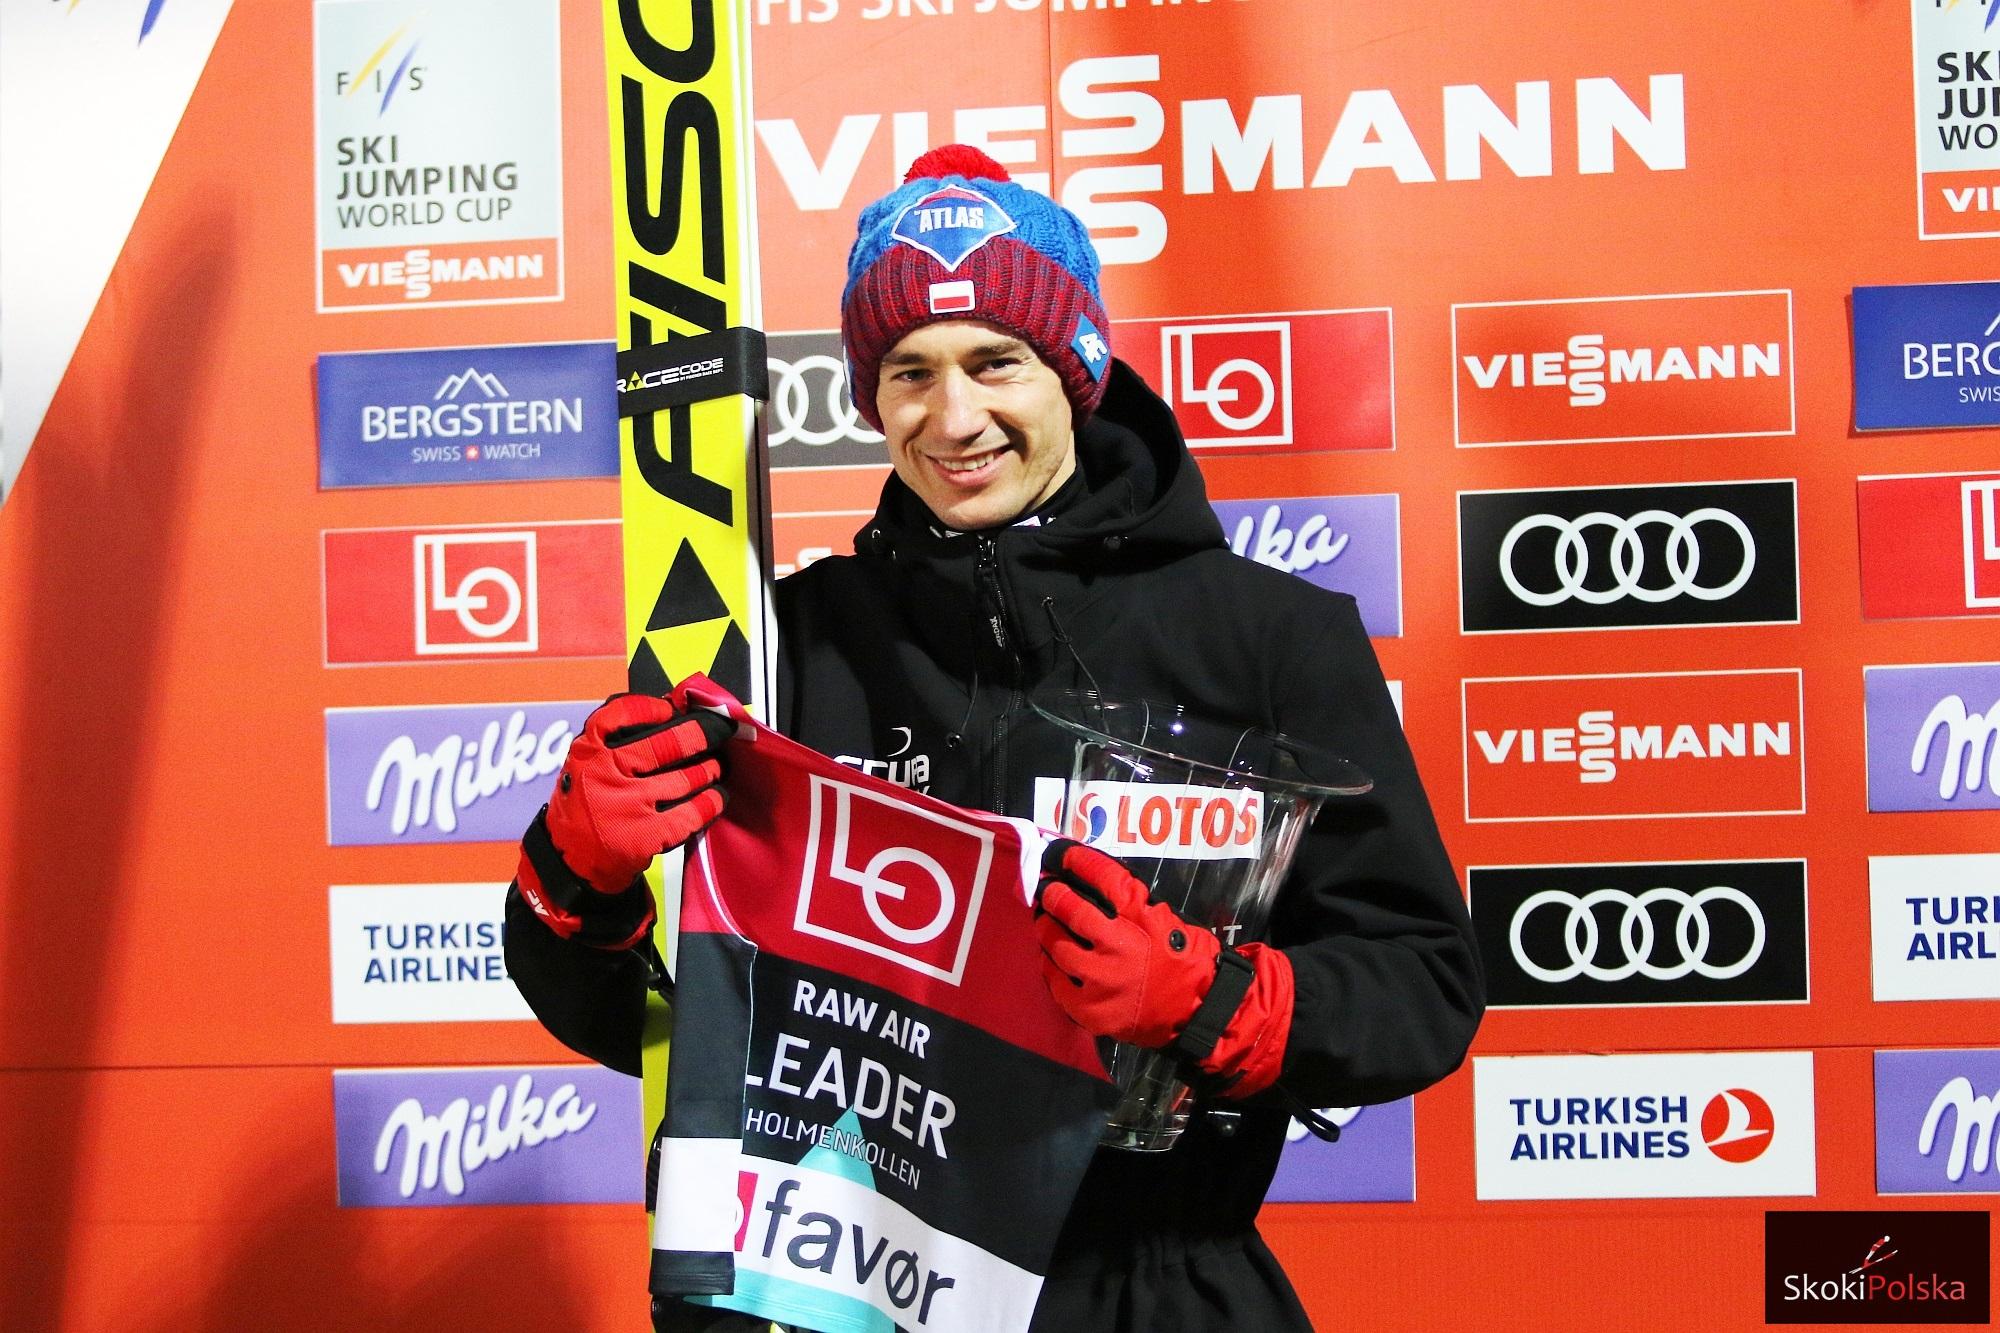 Kamil Stoch z koszulką lidera Raw Air w Oslo (fot. Julia Piątkowska)